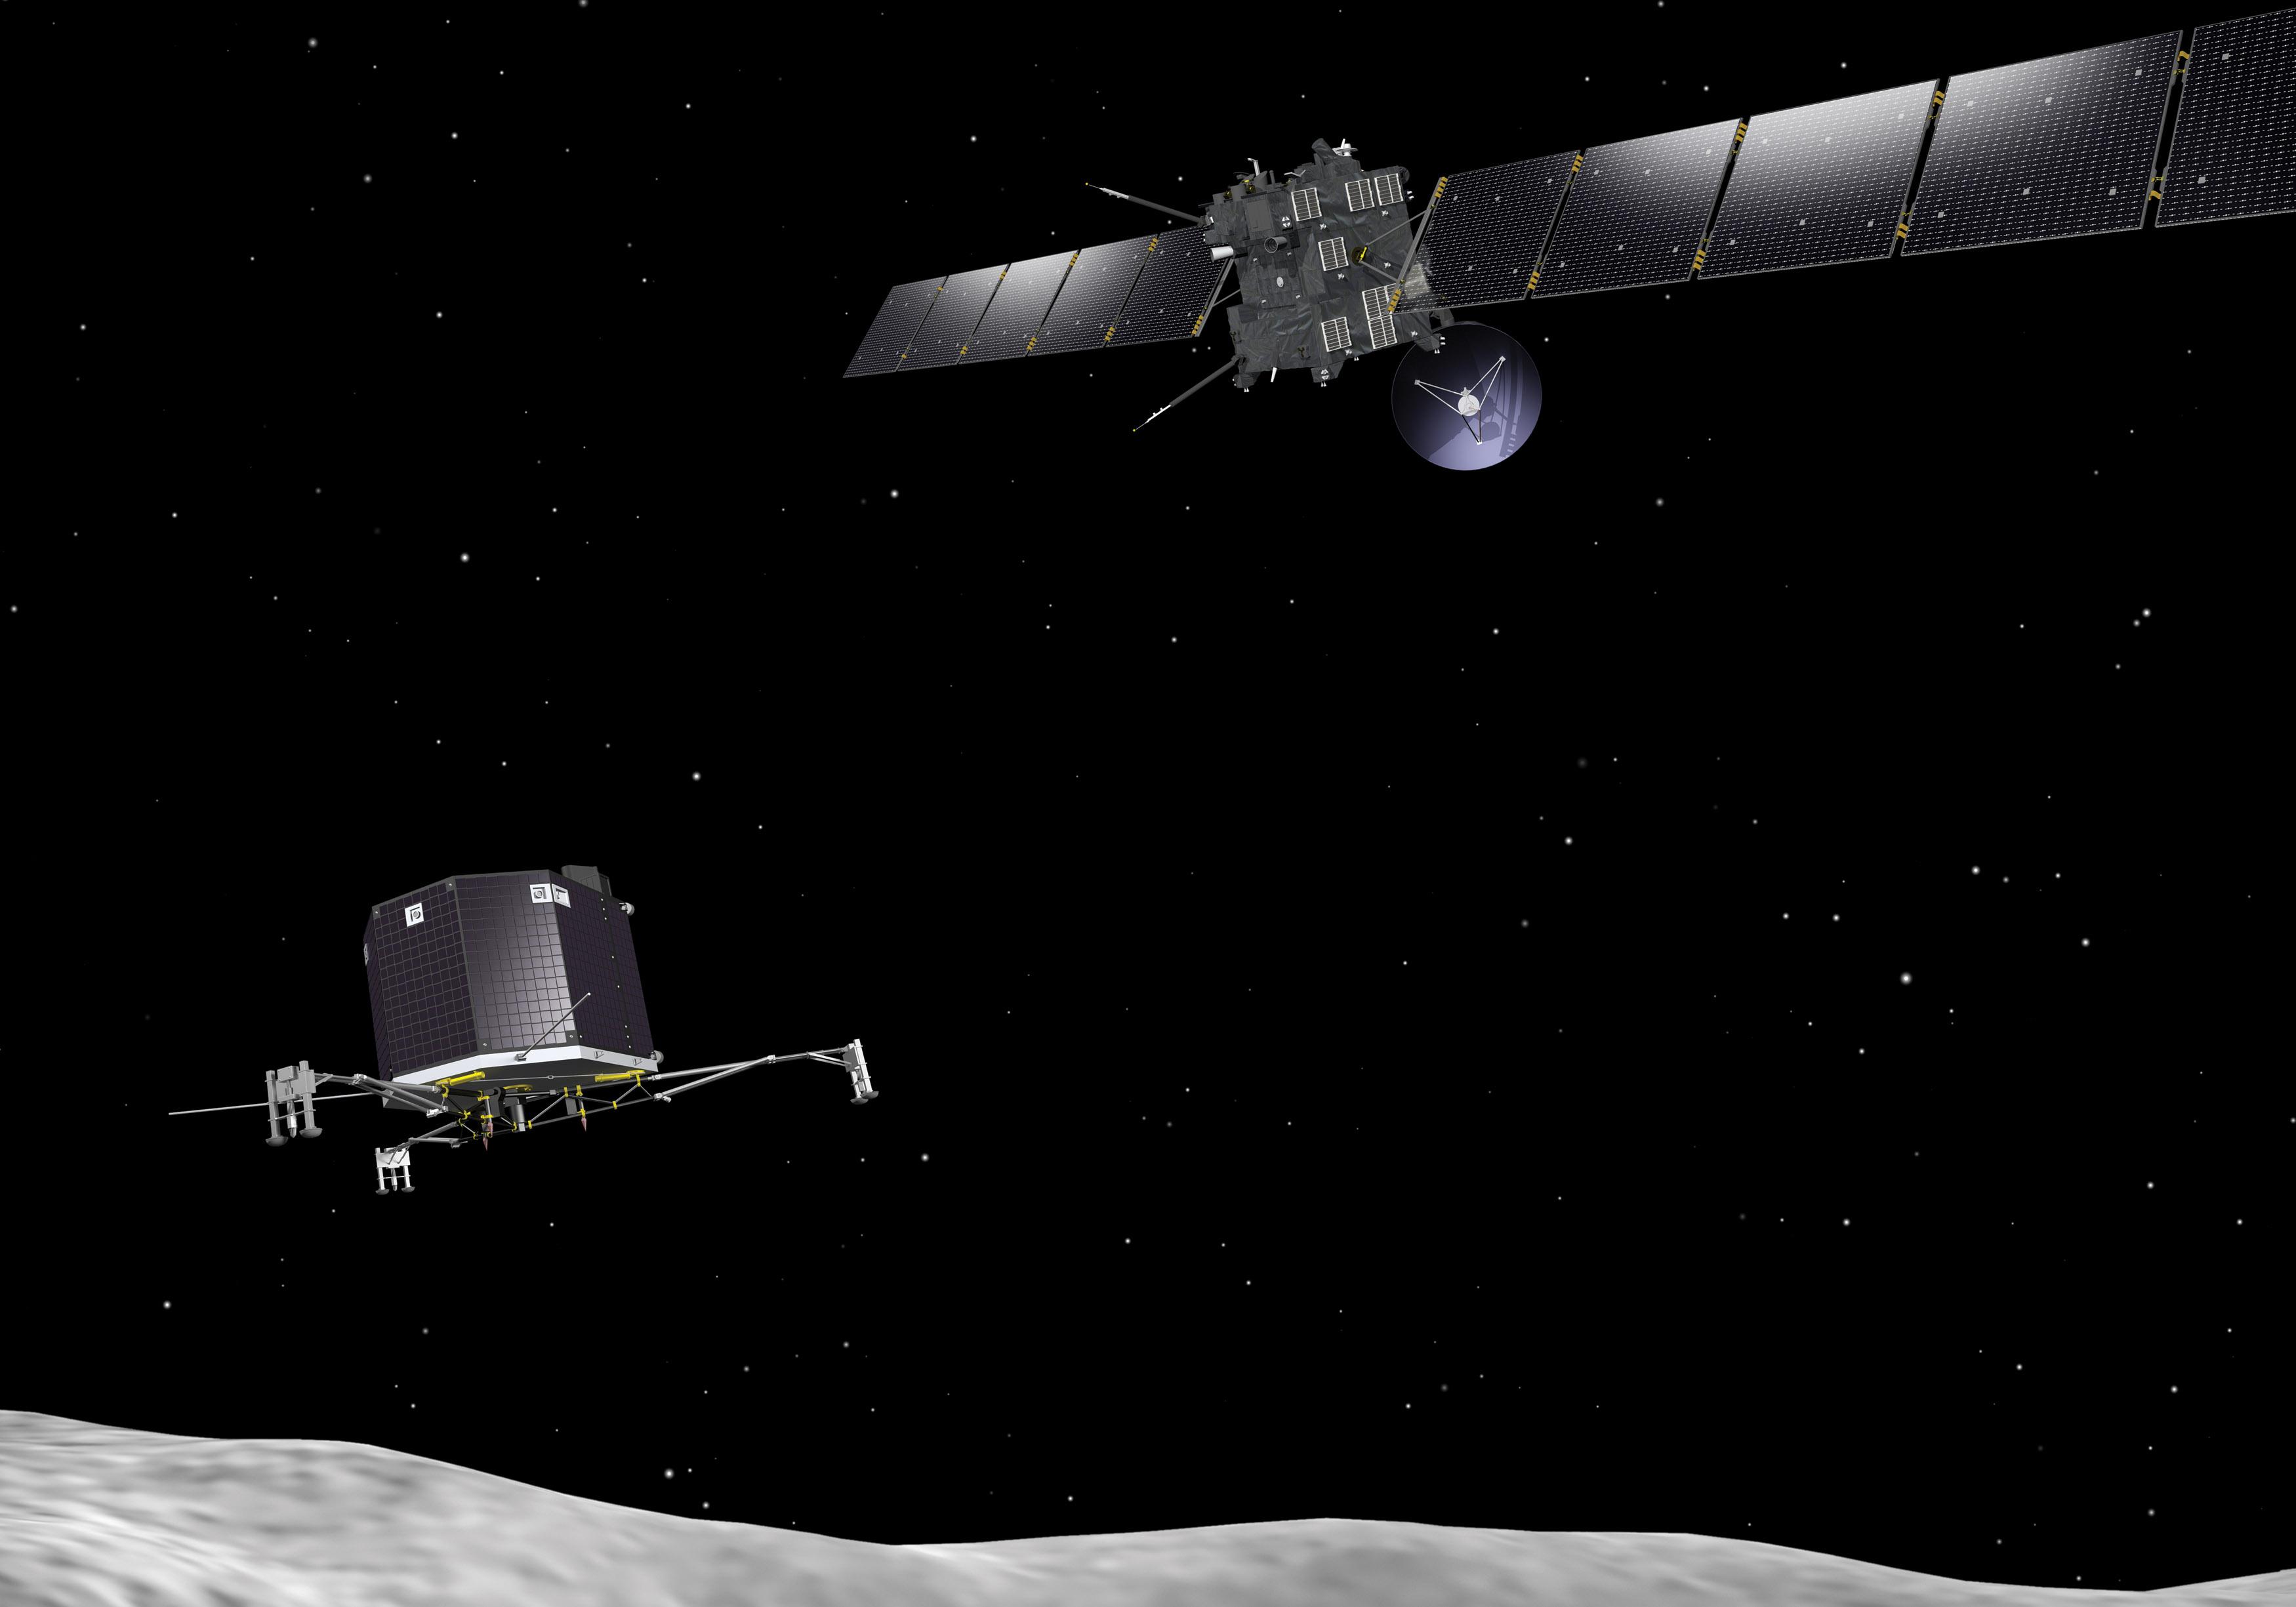 http://www.esa.int/var/esa/storage/images/esa_multimedia/images/2013/12/rosetta_and_philae_at_comet6/13463574-2-eng-GB/Rosetta_and_Philae_at_comet.jpg